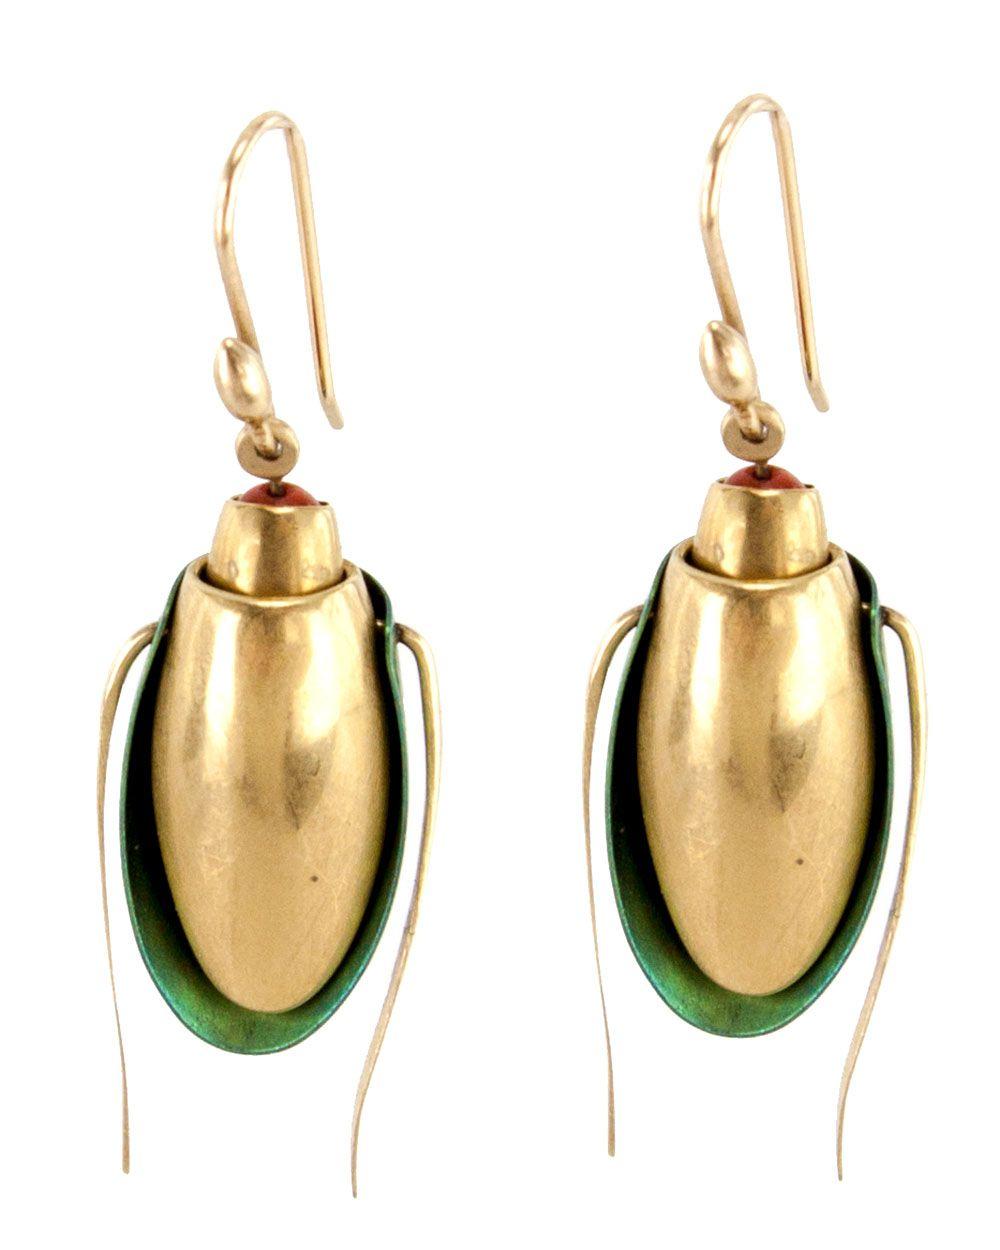 d1a039f1c Ted Muehling | Gold Scarab Niobium Jacket Earrings | Earrings | Jewelry